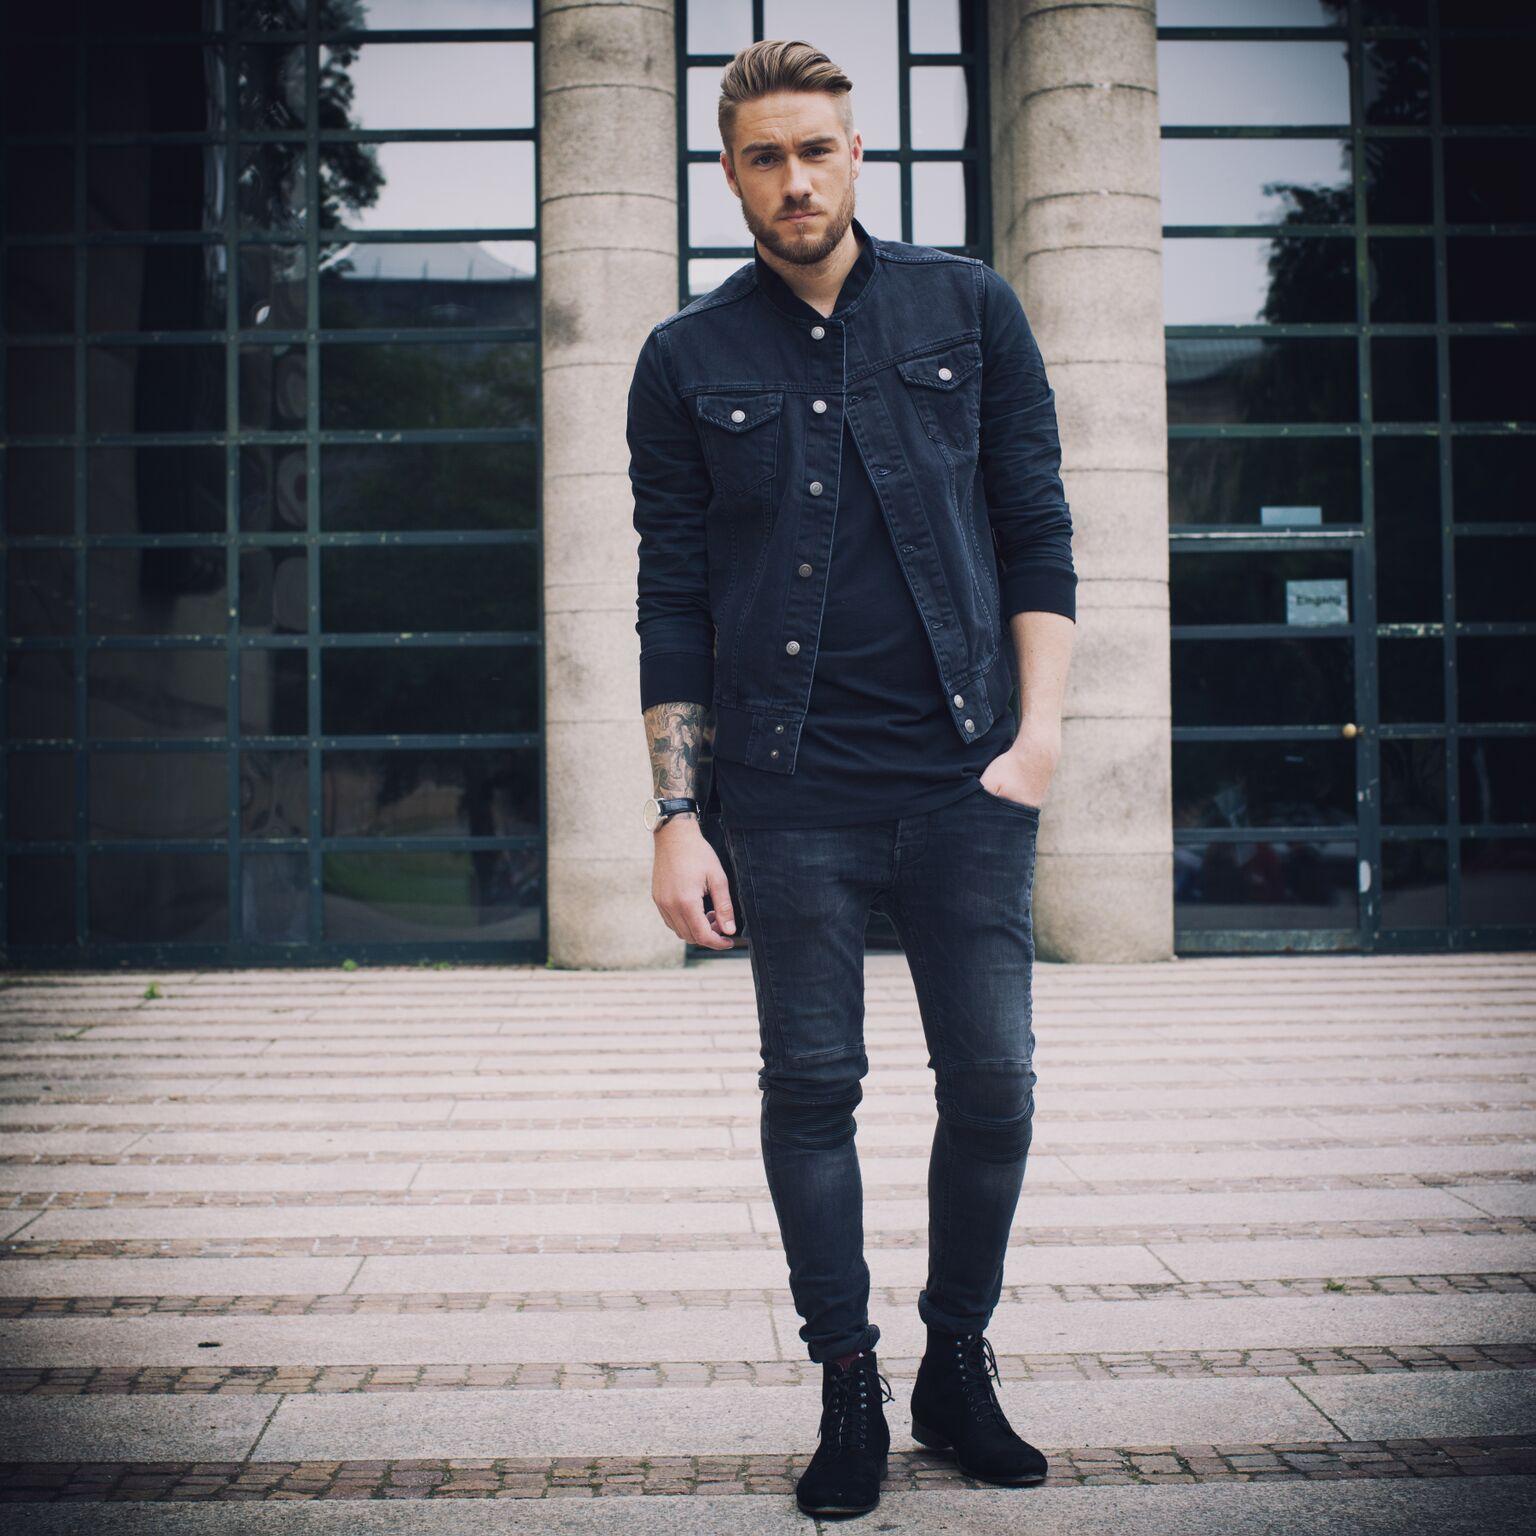 41832f260f Jerk | Streetstyles | Denim bomber jacket, Black denim jeans, Denim ...